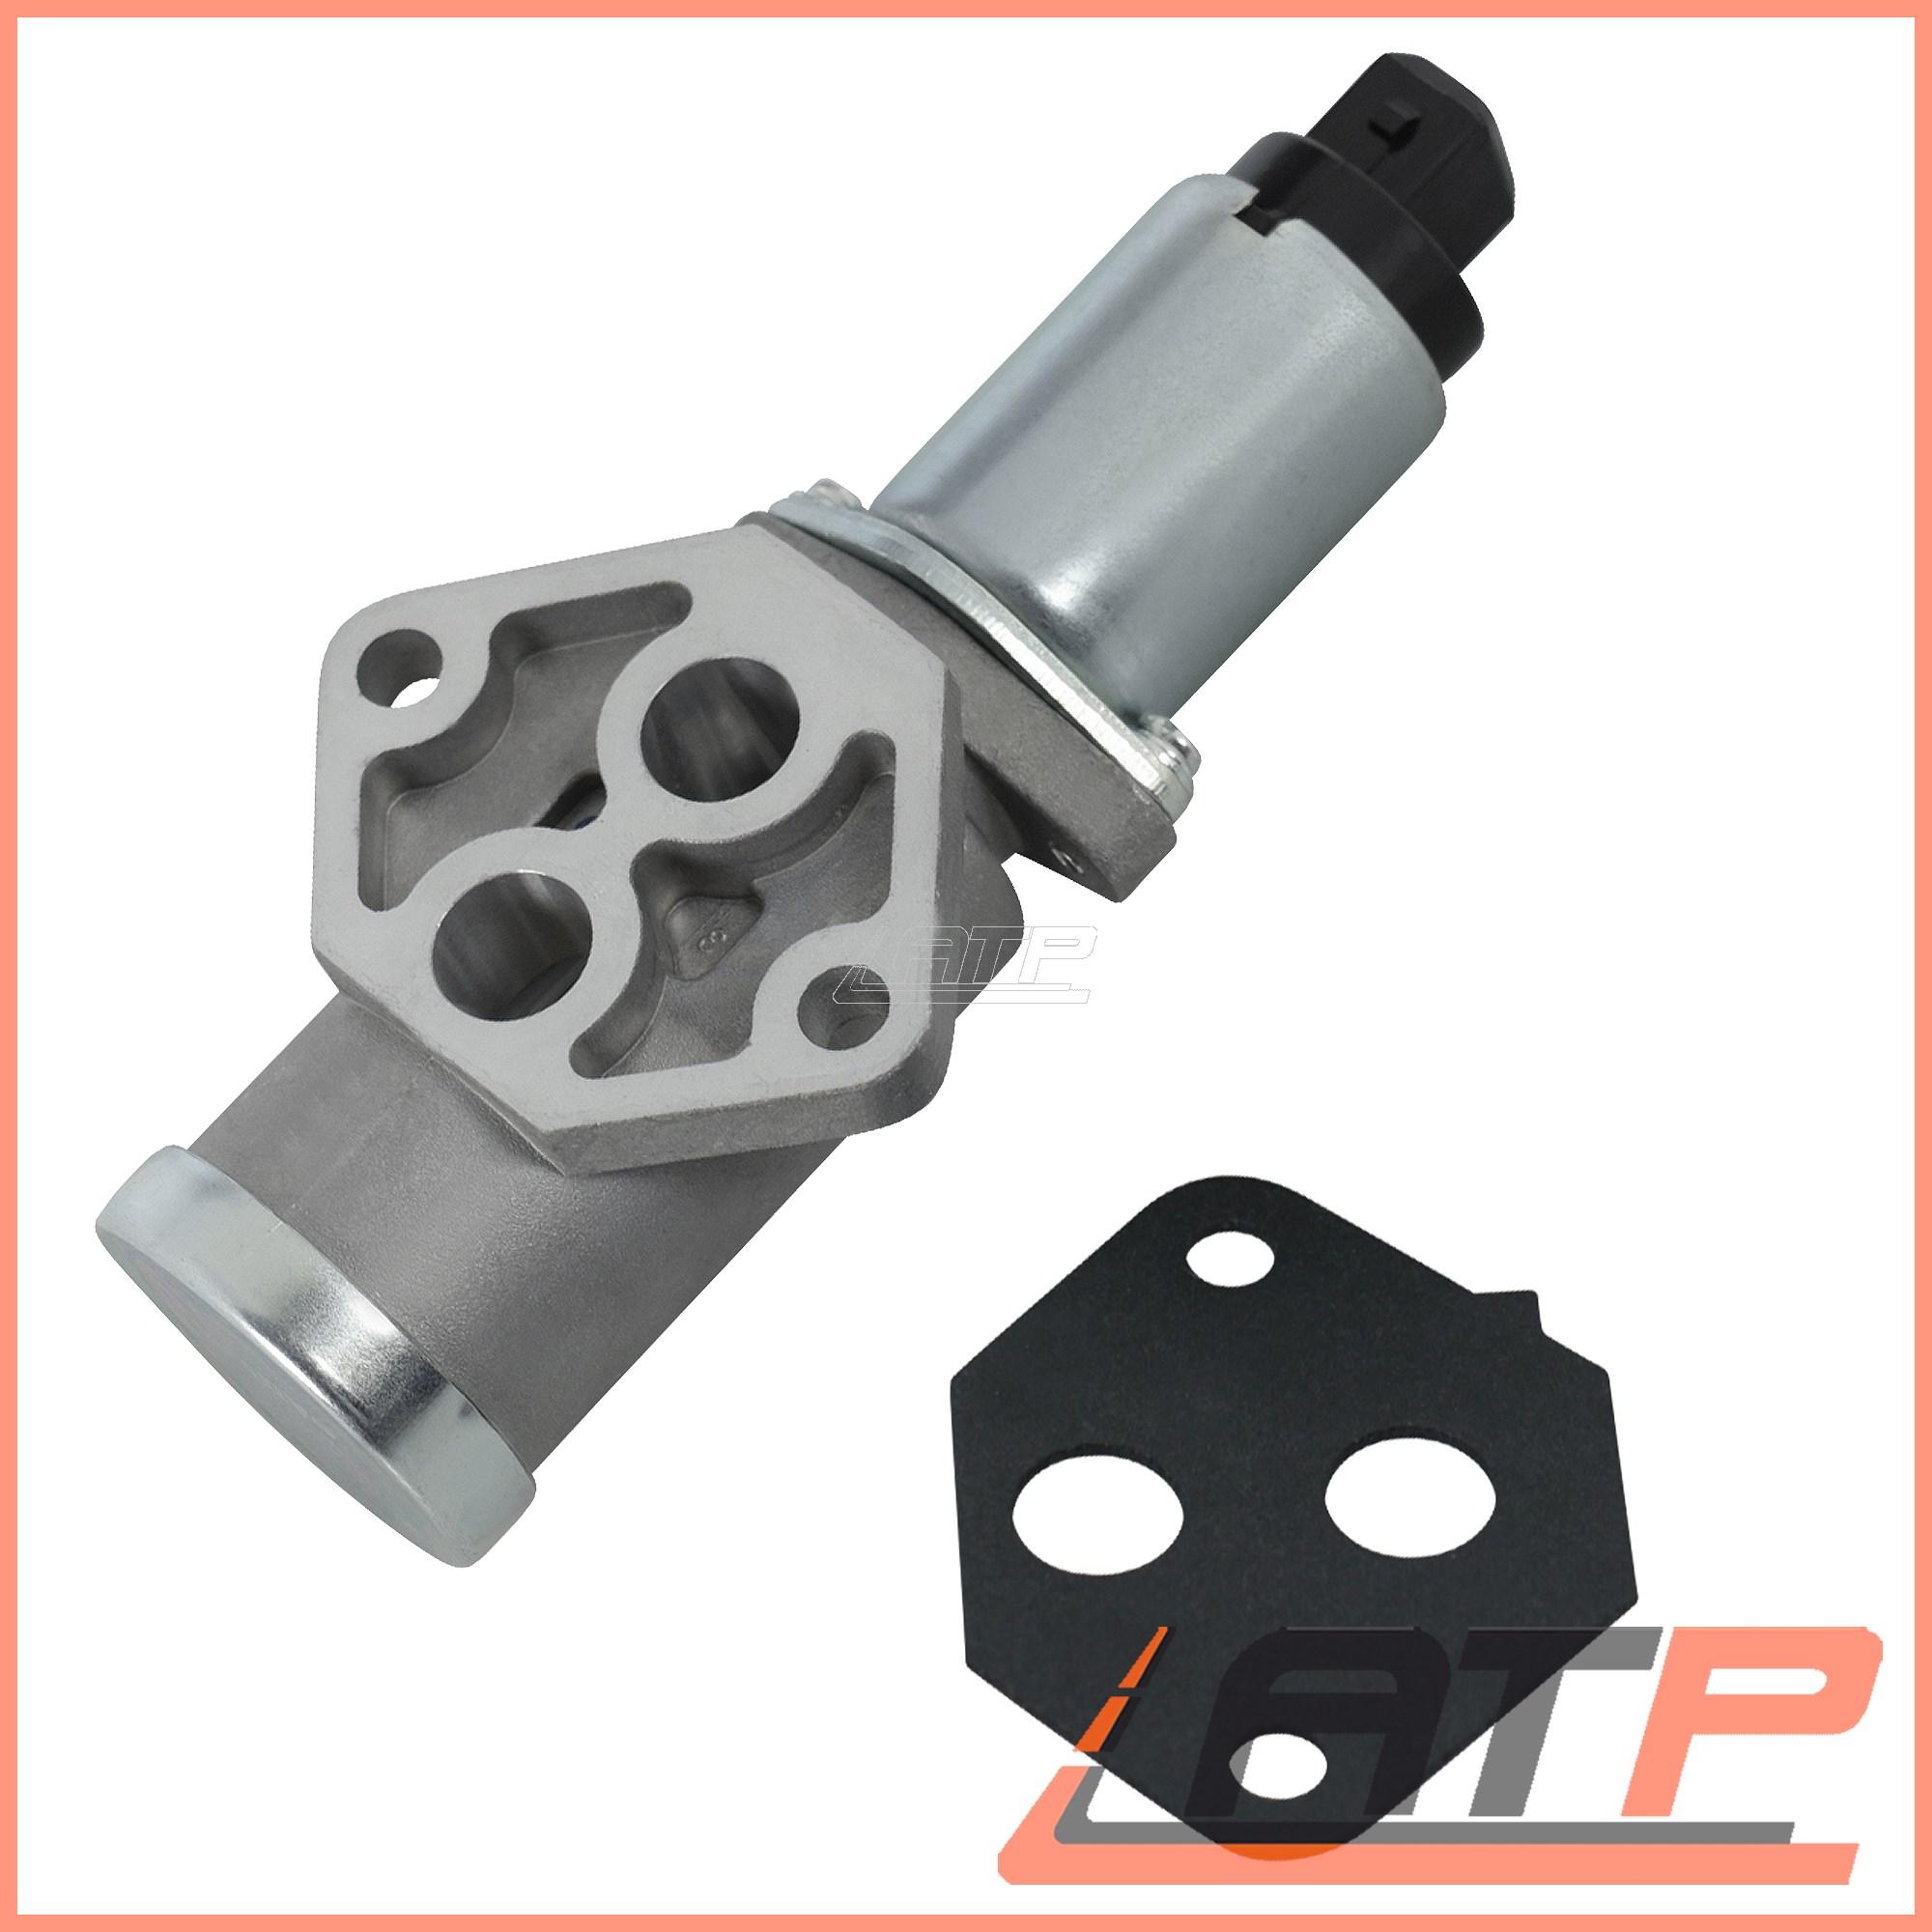 IDLE AIR SPEED CONTROL VALVE FIAT BRAVO MK 1 96-99 BARCHETTA BRAVA 1.8